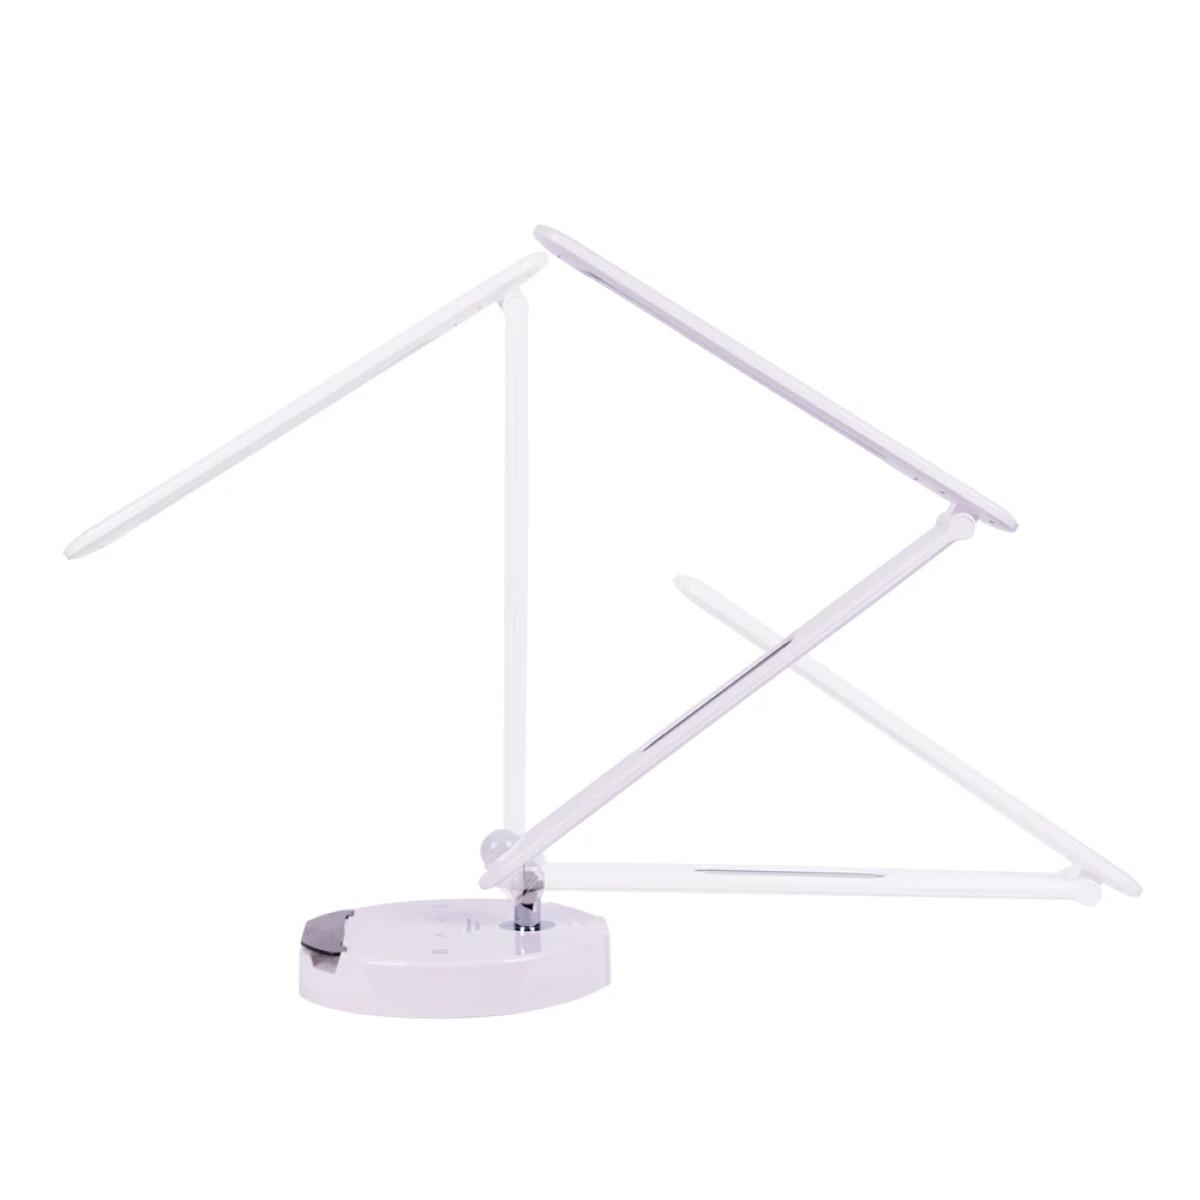 LumiCharge Smart Lamp and Universal Phone Dock - Adjustable Positions